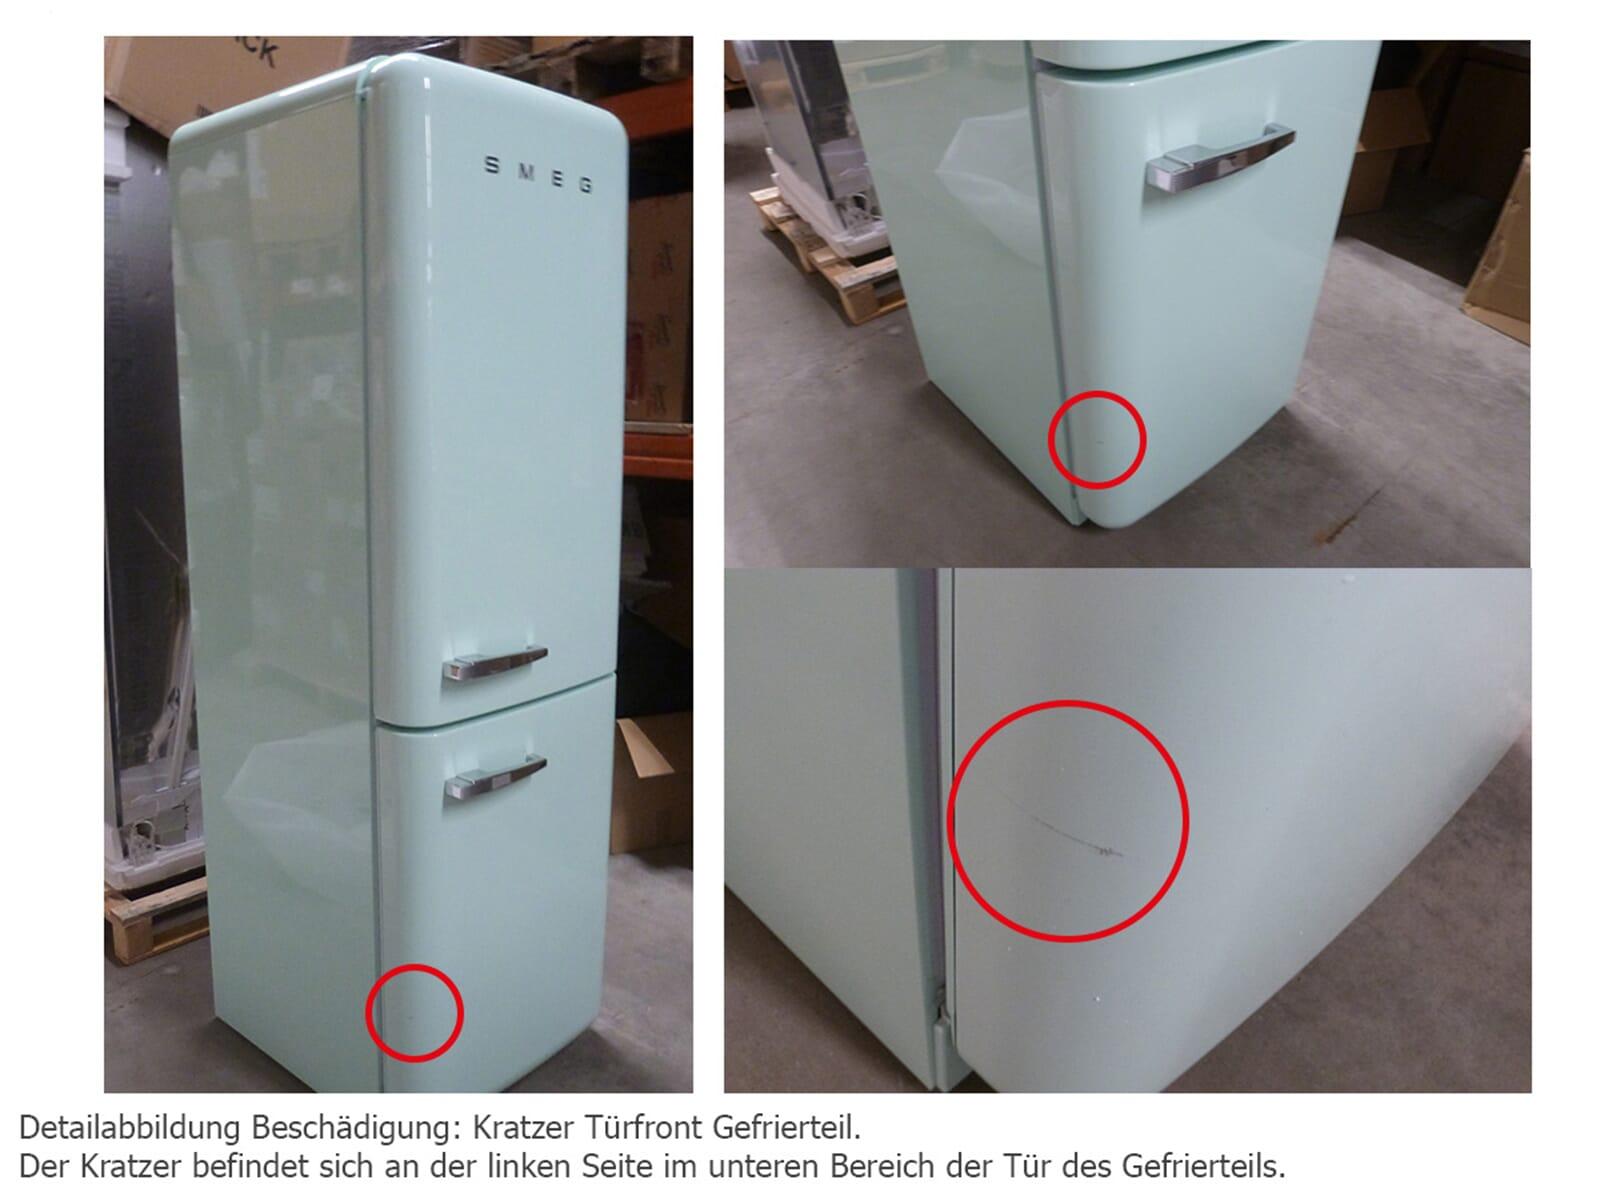 Smeg Kühlschrank Pastellgrün : Smeg fab rpg kühl gefrierkombination pastellgrün b ware